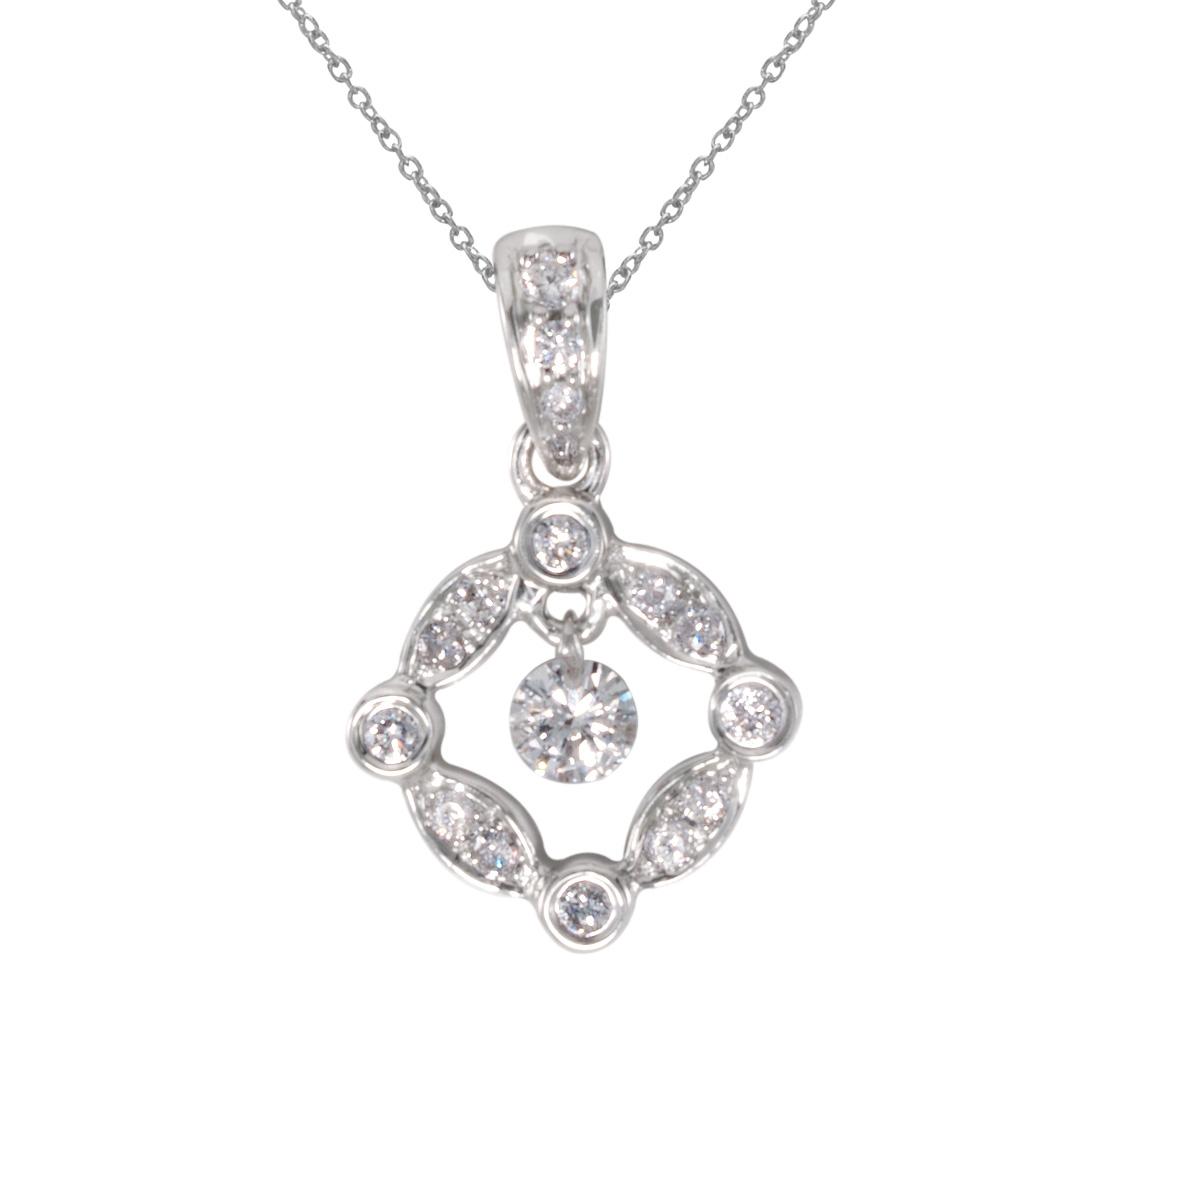 14k gold Dashinng Diamonds pendant with 0.25 total ct diamonds. The center dangling diamond dance...